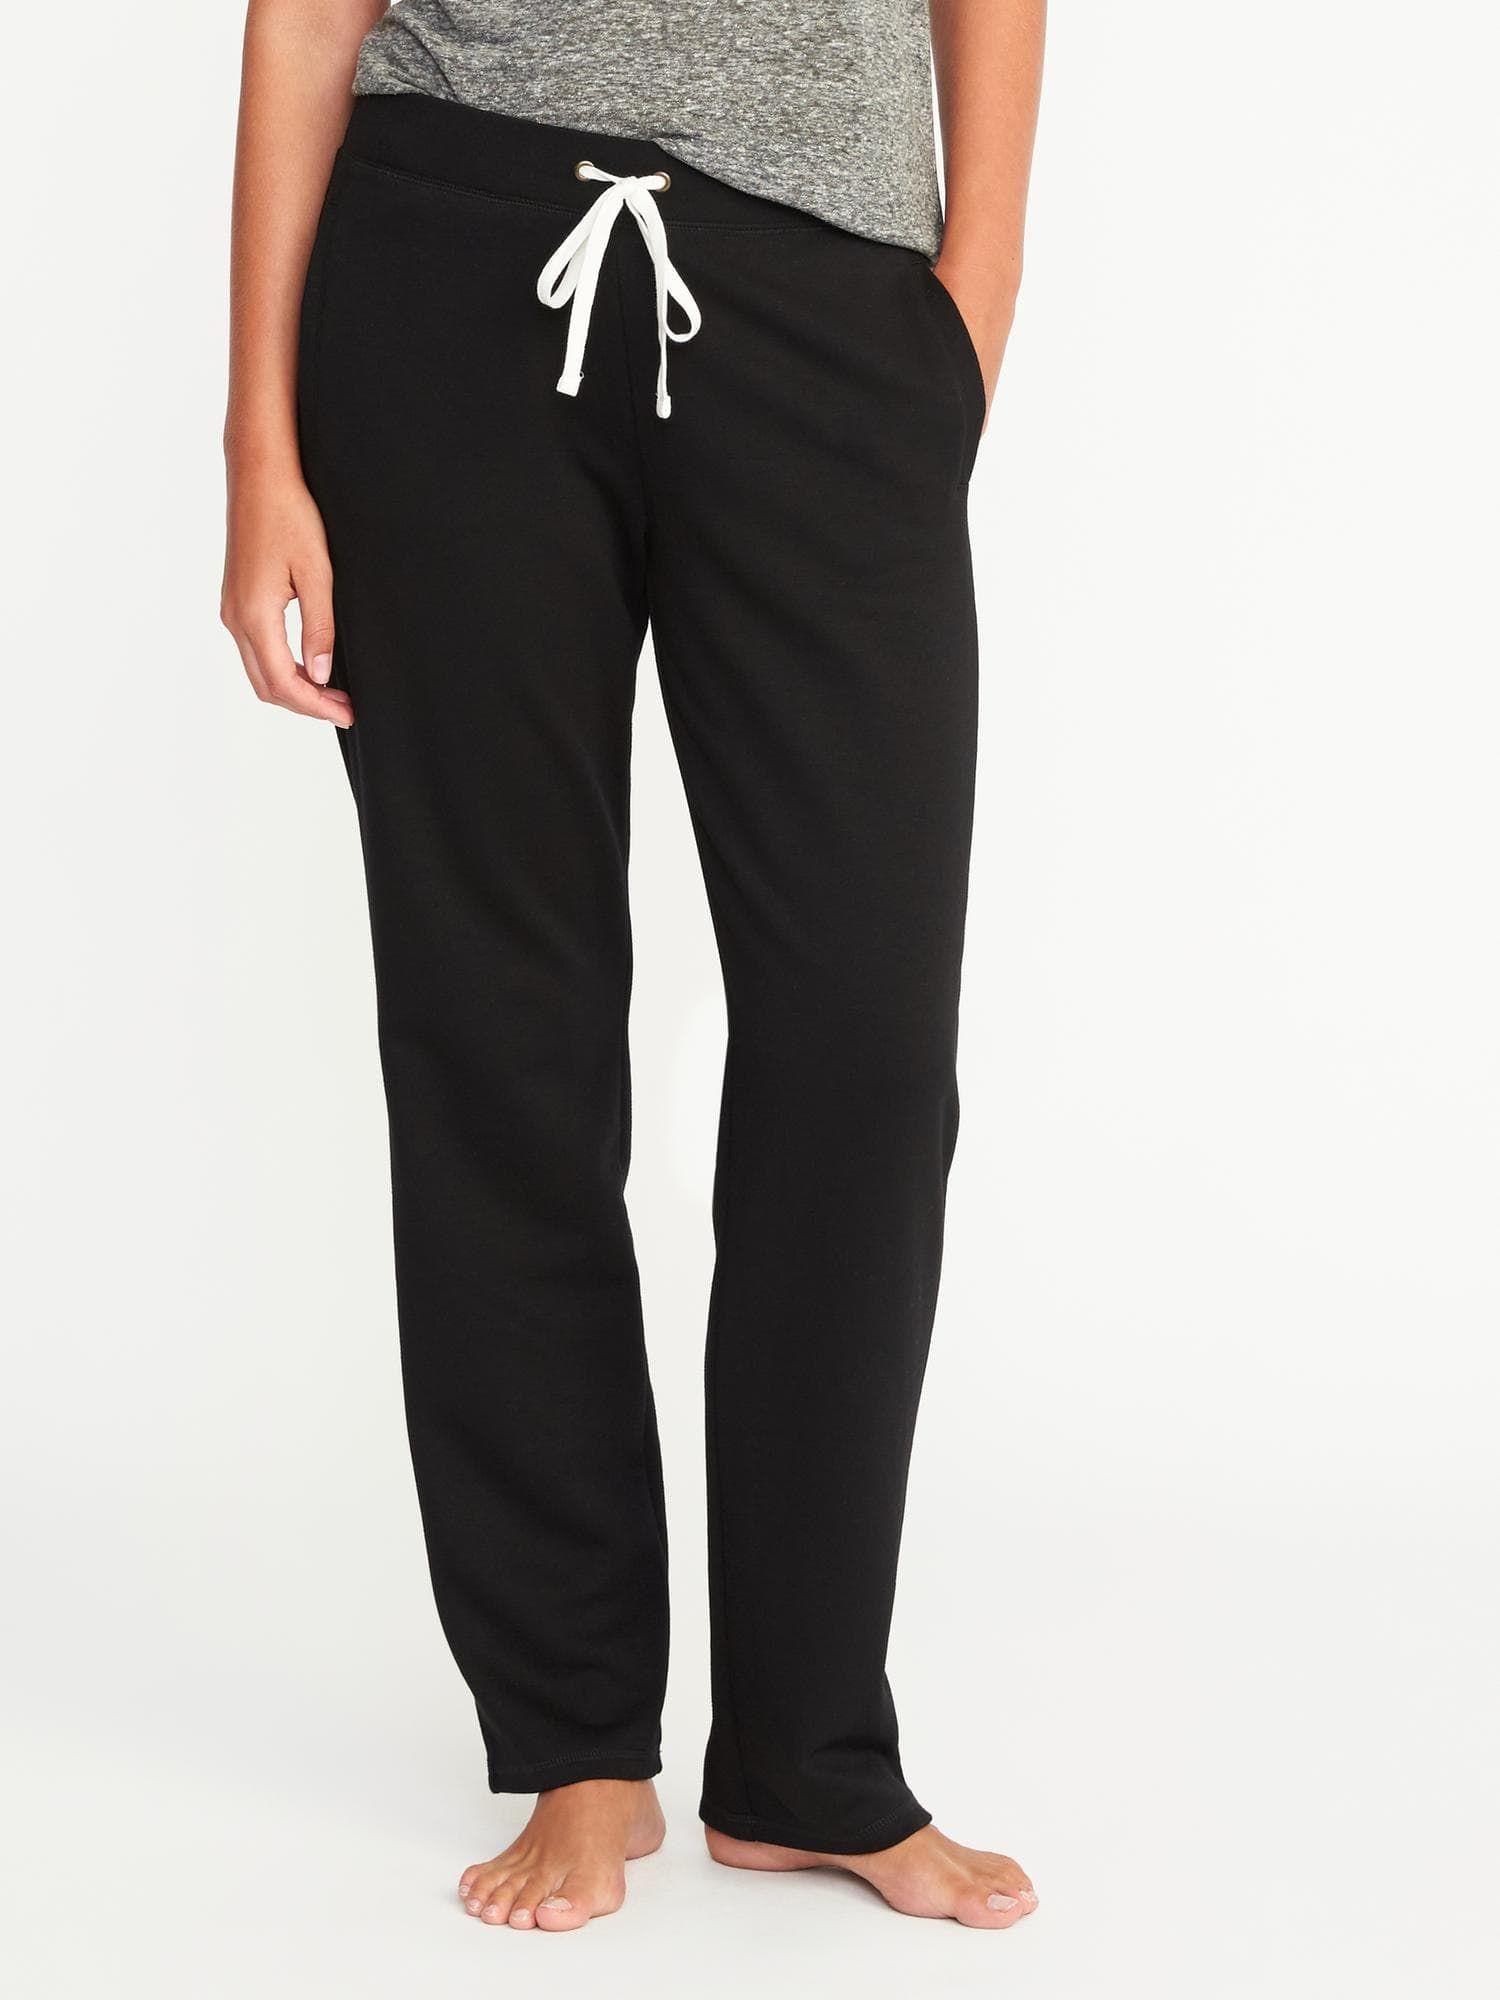 1b3cd40a11b French Terry Straight-Leg Sweatpants for Women